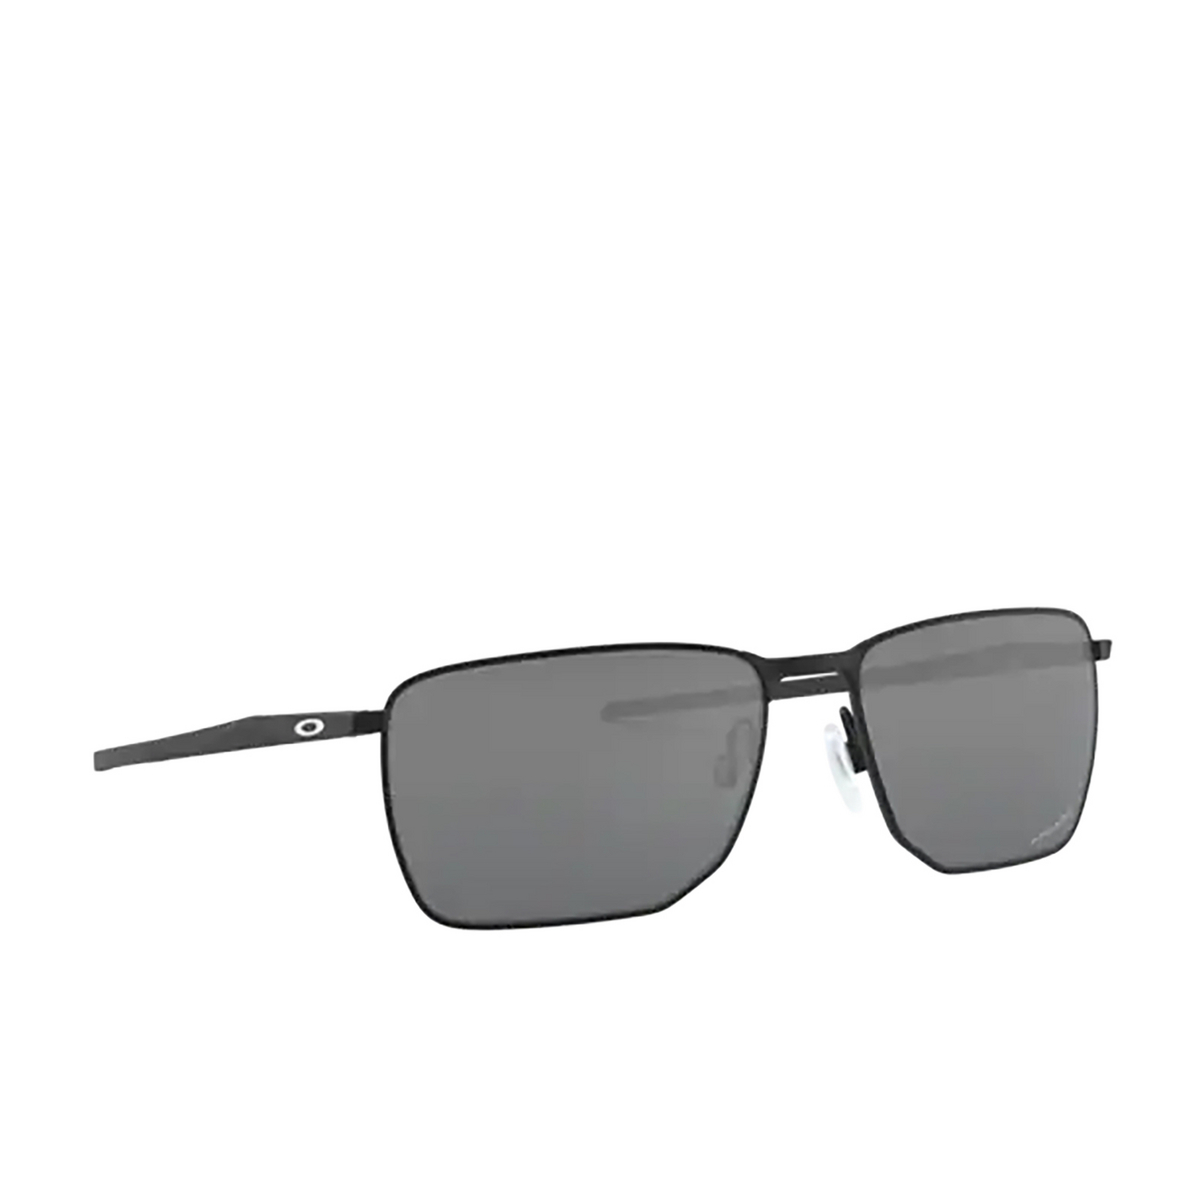 Oakley® Rectangle Sunglasses: Ejector OO4142 color Satin Black 414201 - three-quarters view.